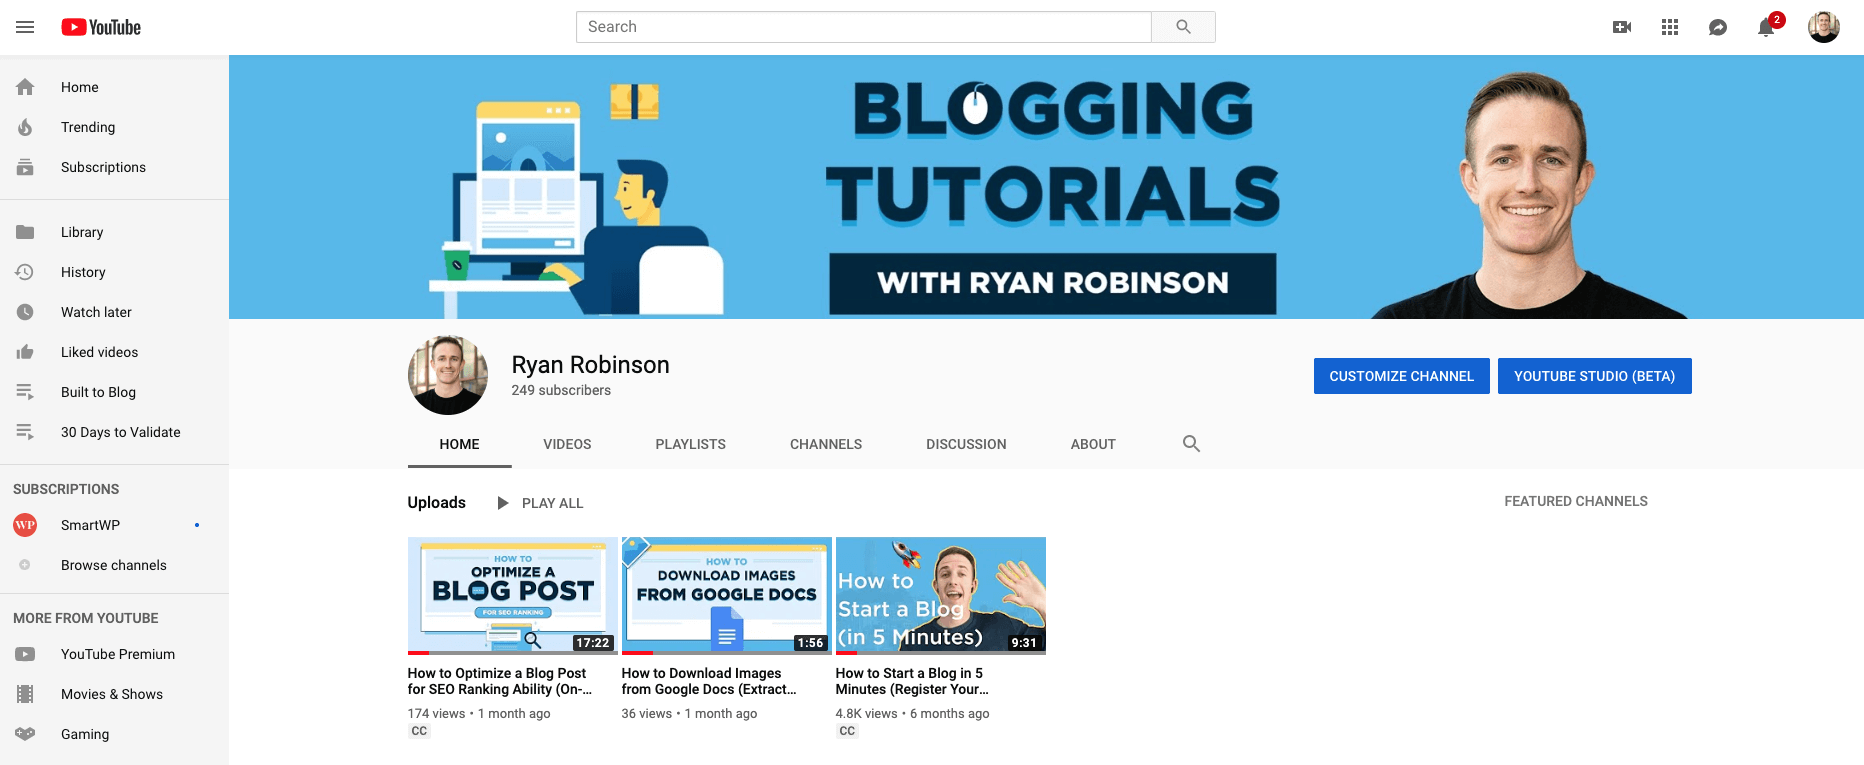 YouTube Channel Best Blogging Tools Ryan Robinson Screenshot